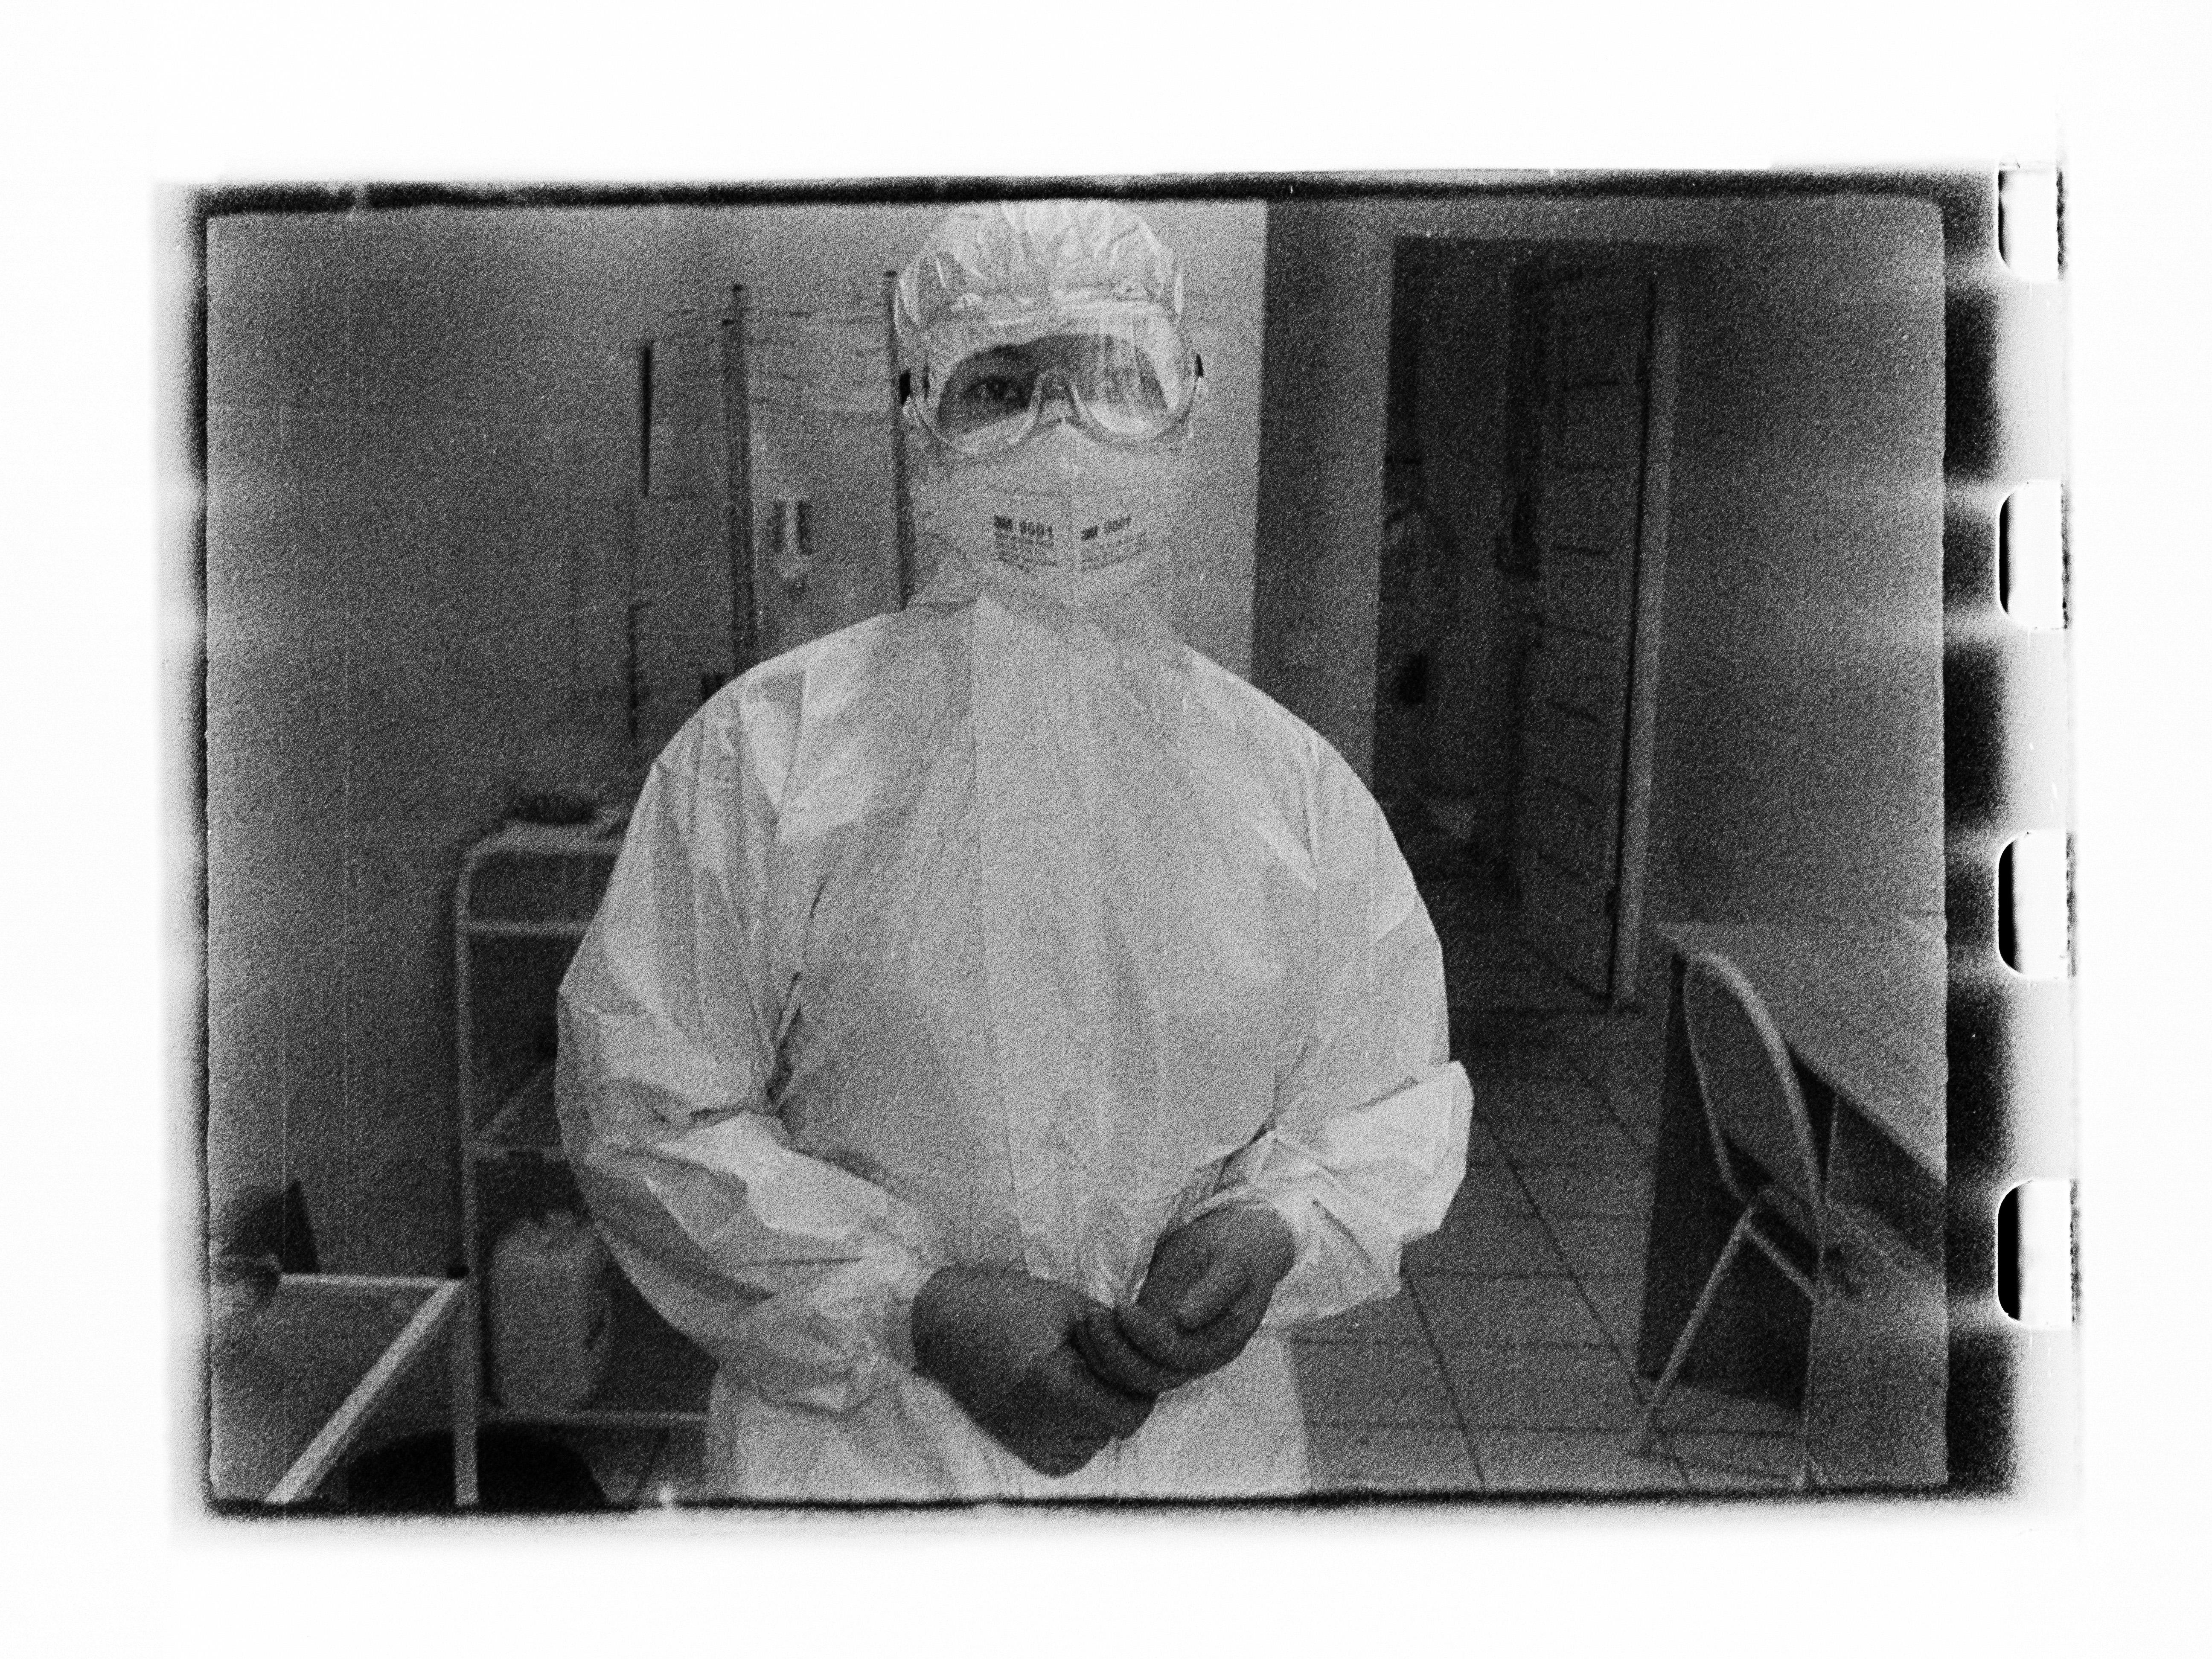 Medic posing (Pic: Andrey Khludeyev)